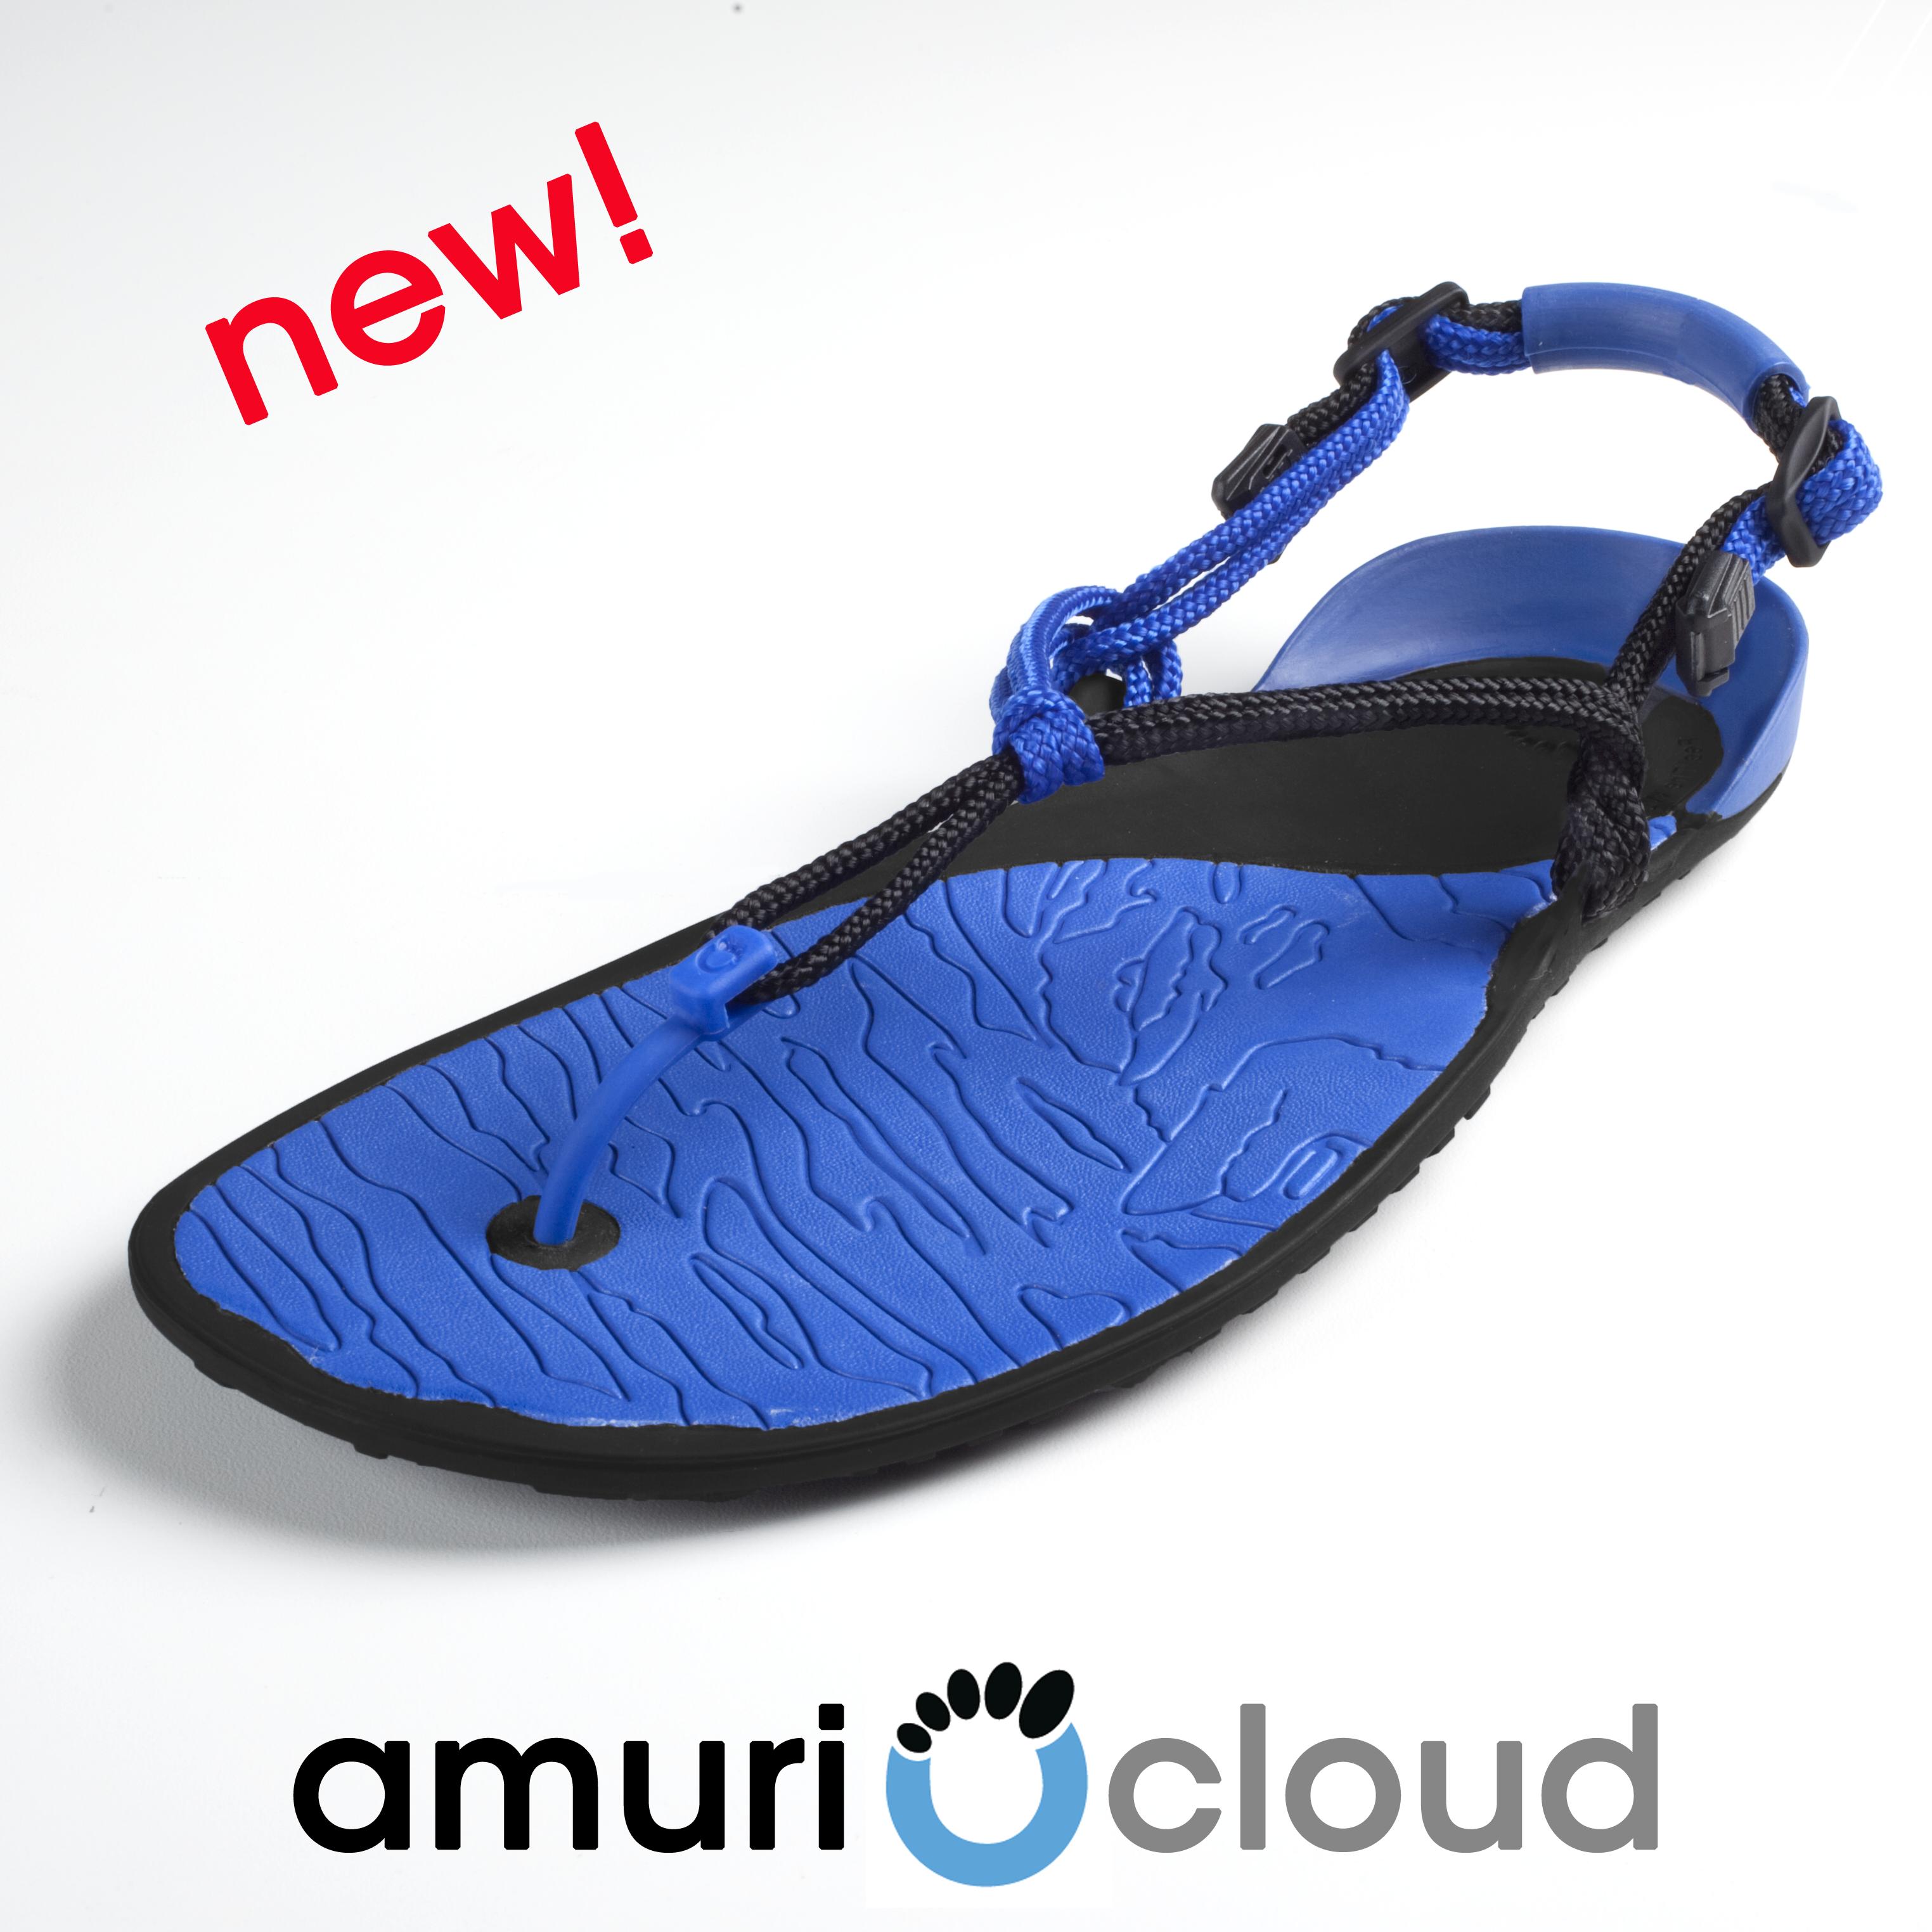 Simple Home Gt Footwear Gt Xero Shoes Gt Xero Shoes Women39s Amuri Cloud